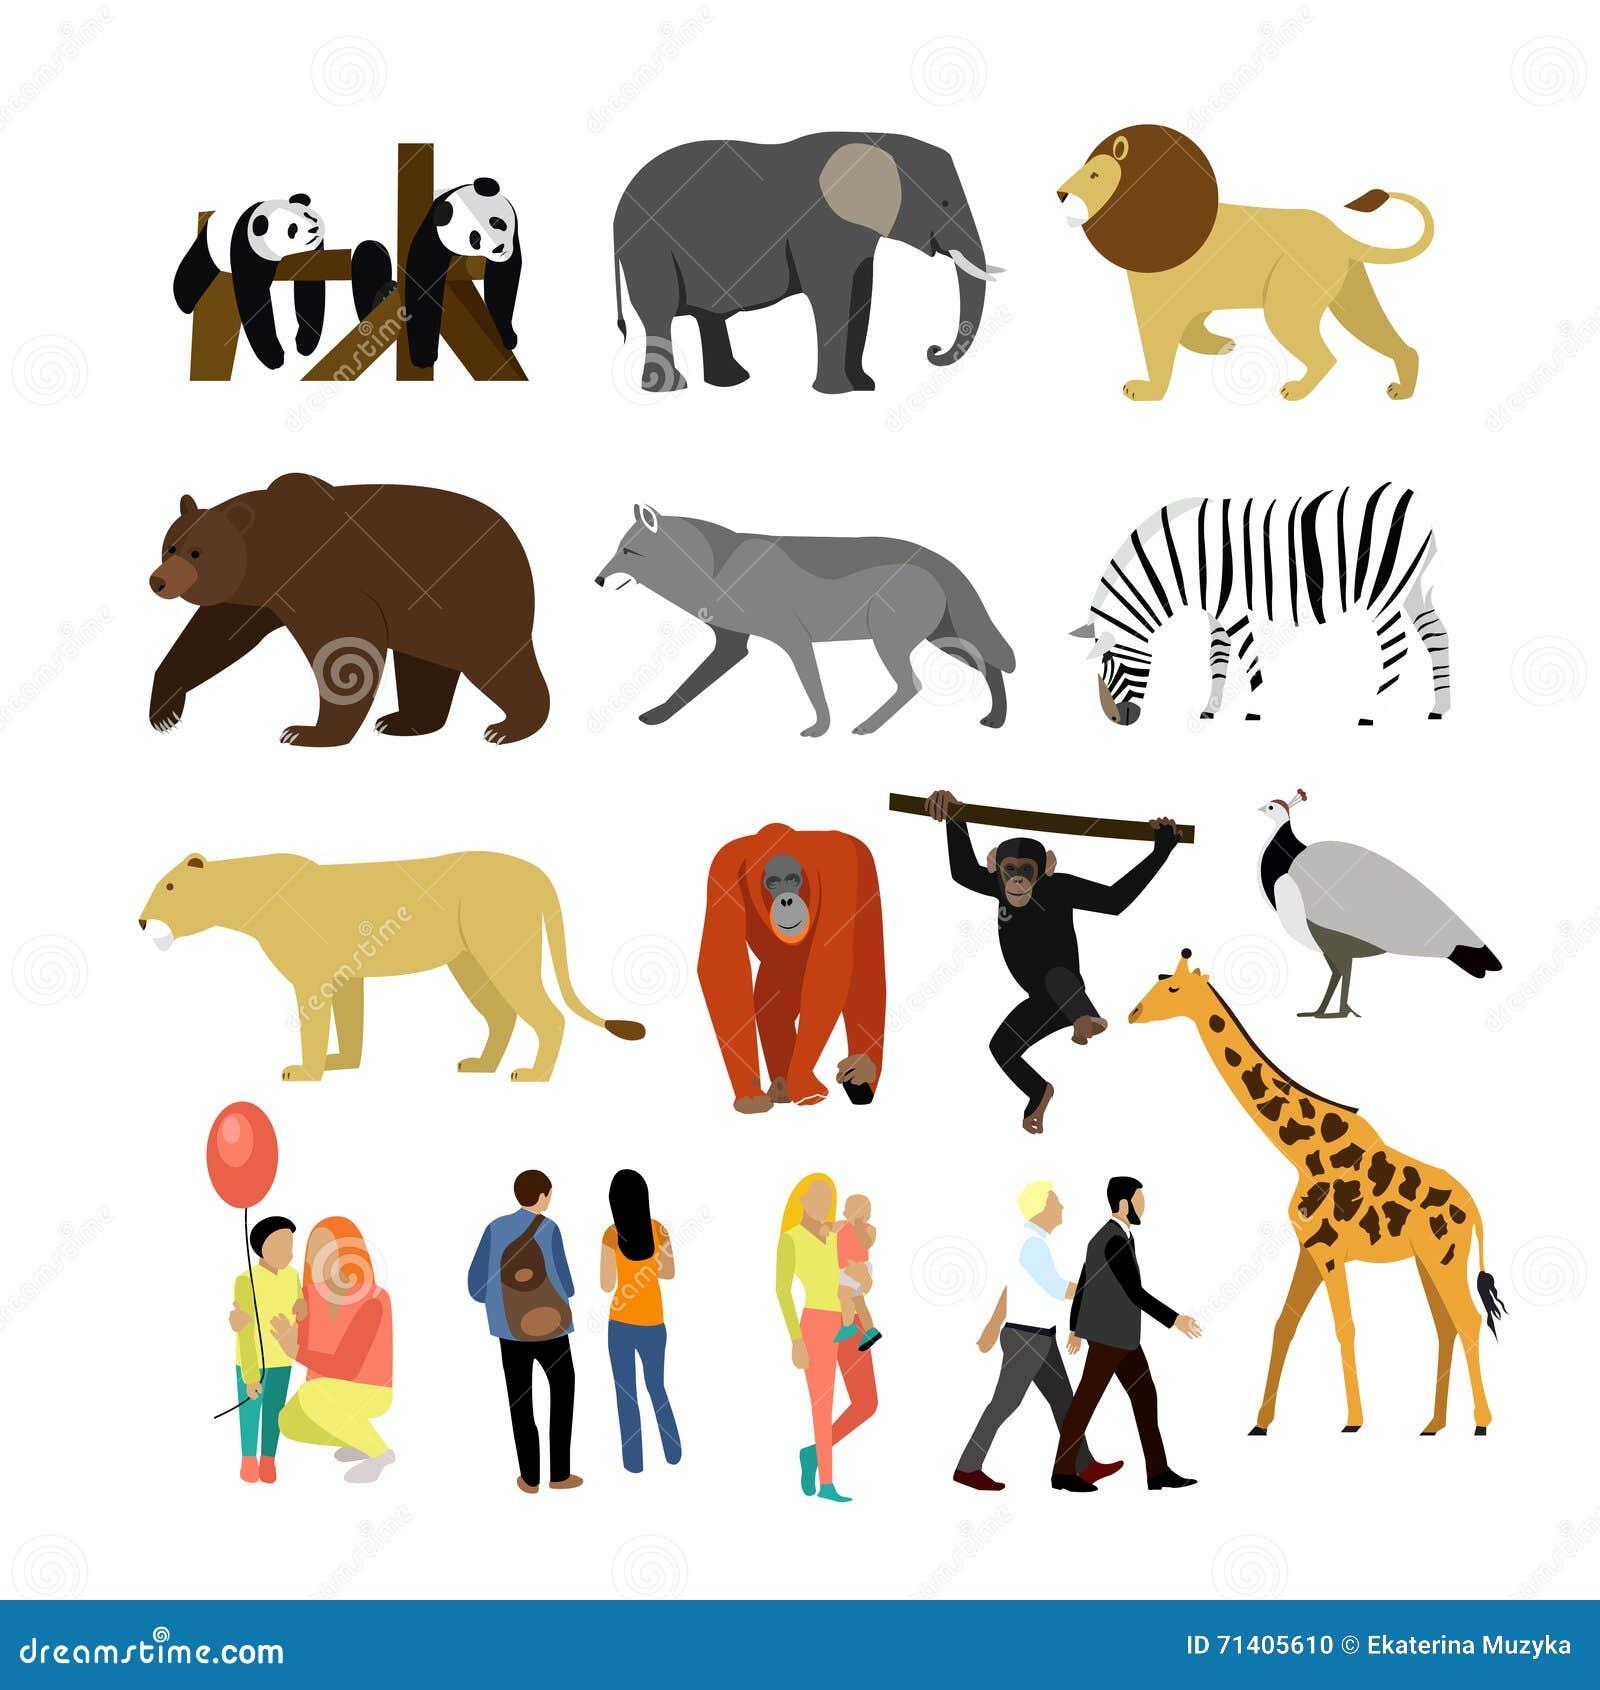 Zoo Animals Isolated On White Background. Vector Illustration. Wild African  Animals. Stock Vector - Illustration of flat, cartoon: 71405610